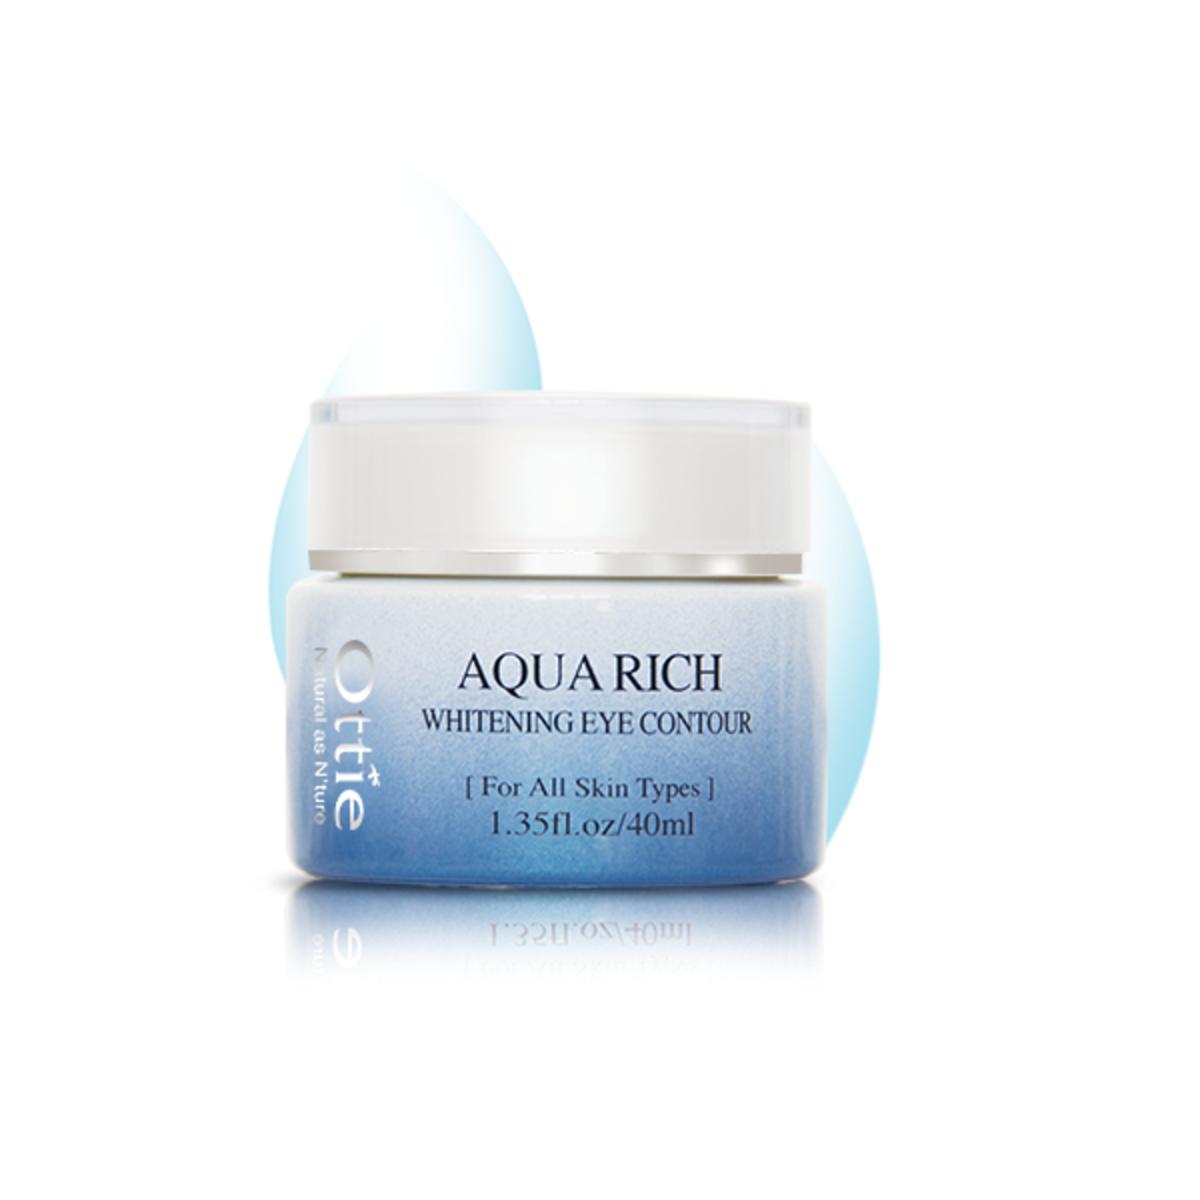 Aqua Rich Whitening Eye Contour40ml